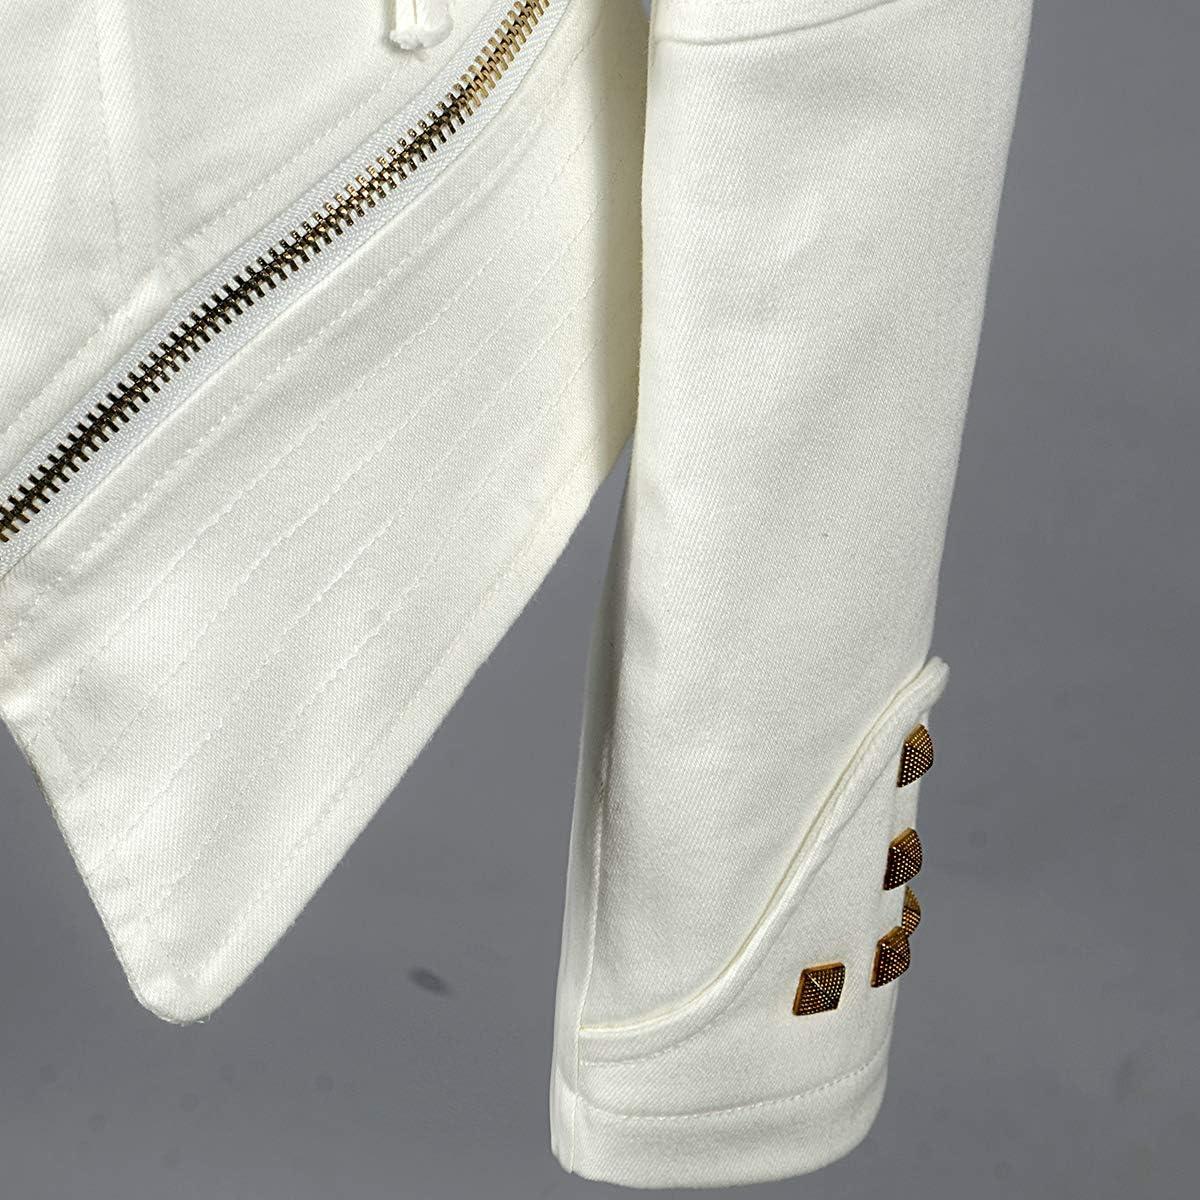 SX Women's Fashion Lapel Zip Up Studded Shoulder Lapel Denim Jeans Blazer Moto Biker Jacket